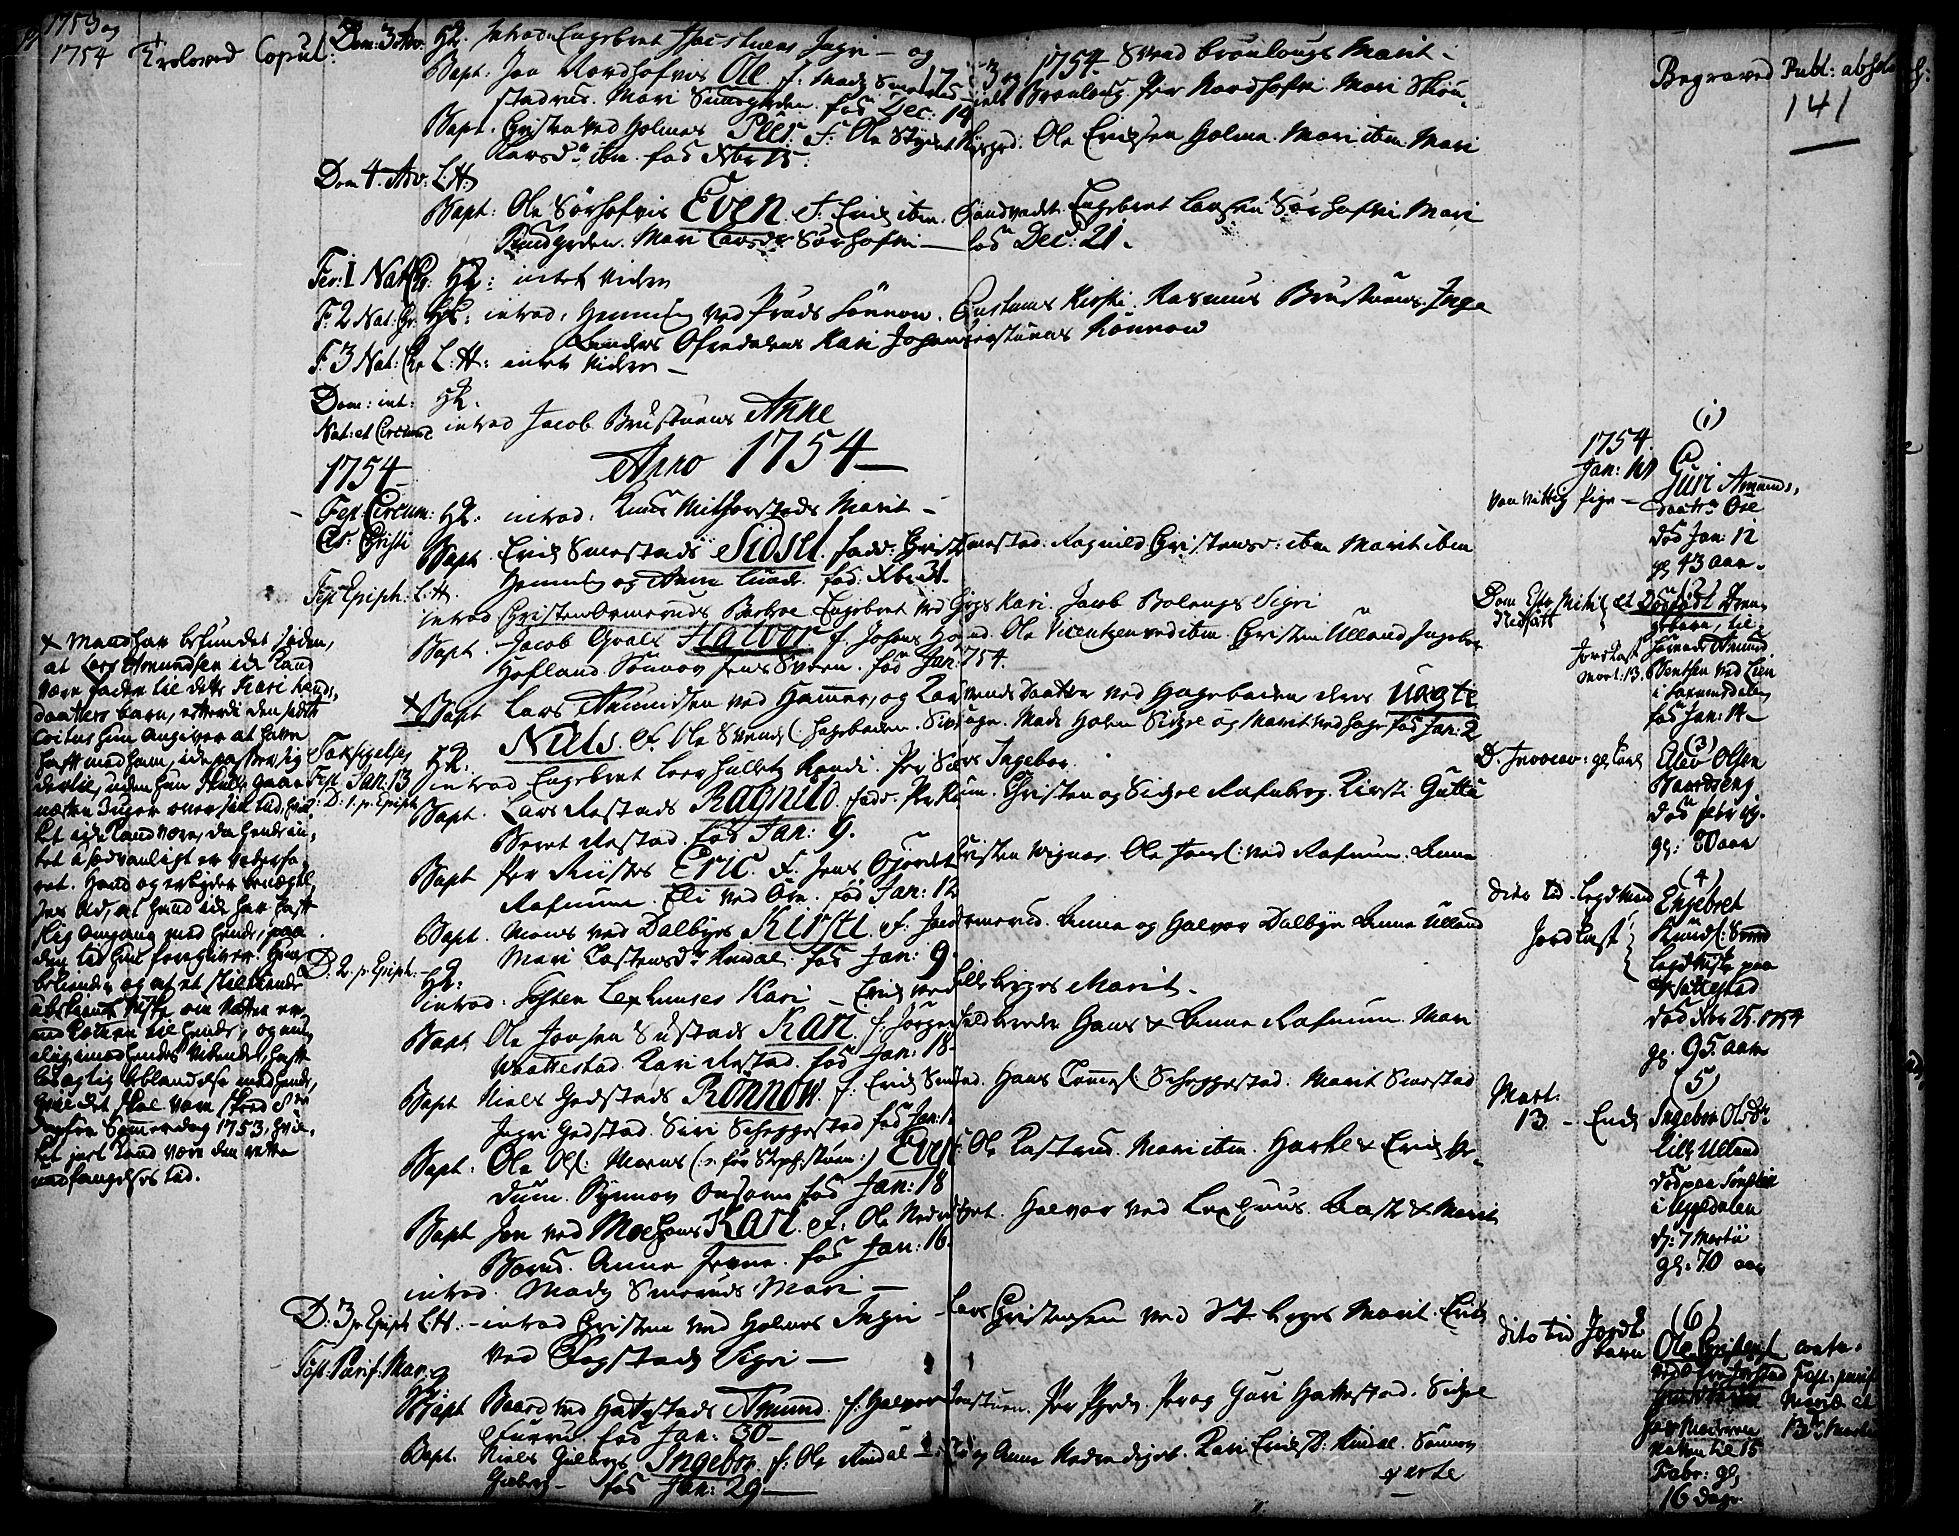 SAH, Fåberg prestekontor, Ministerialbok nr. 1, 1727-1775, s. 141